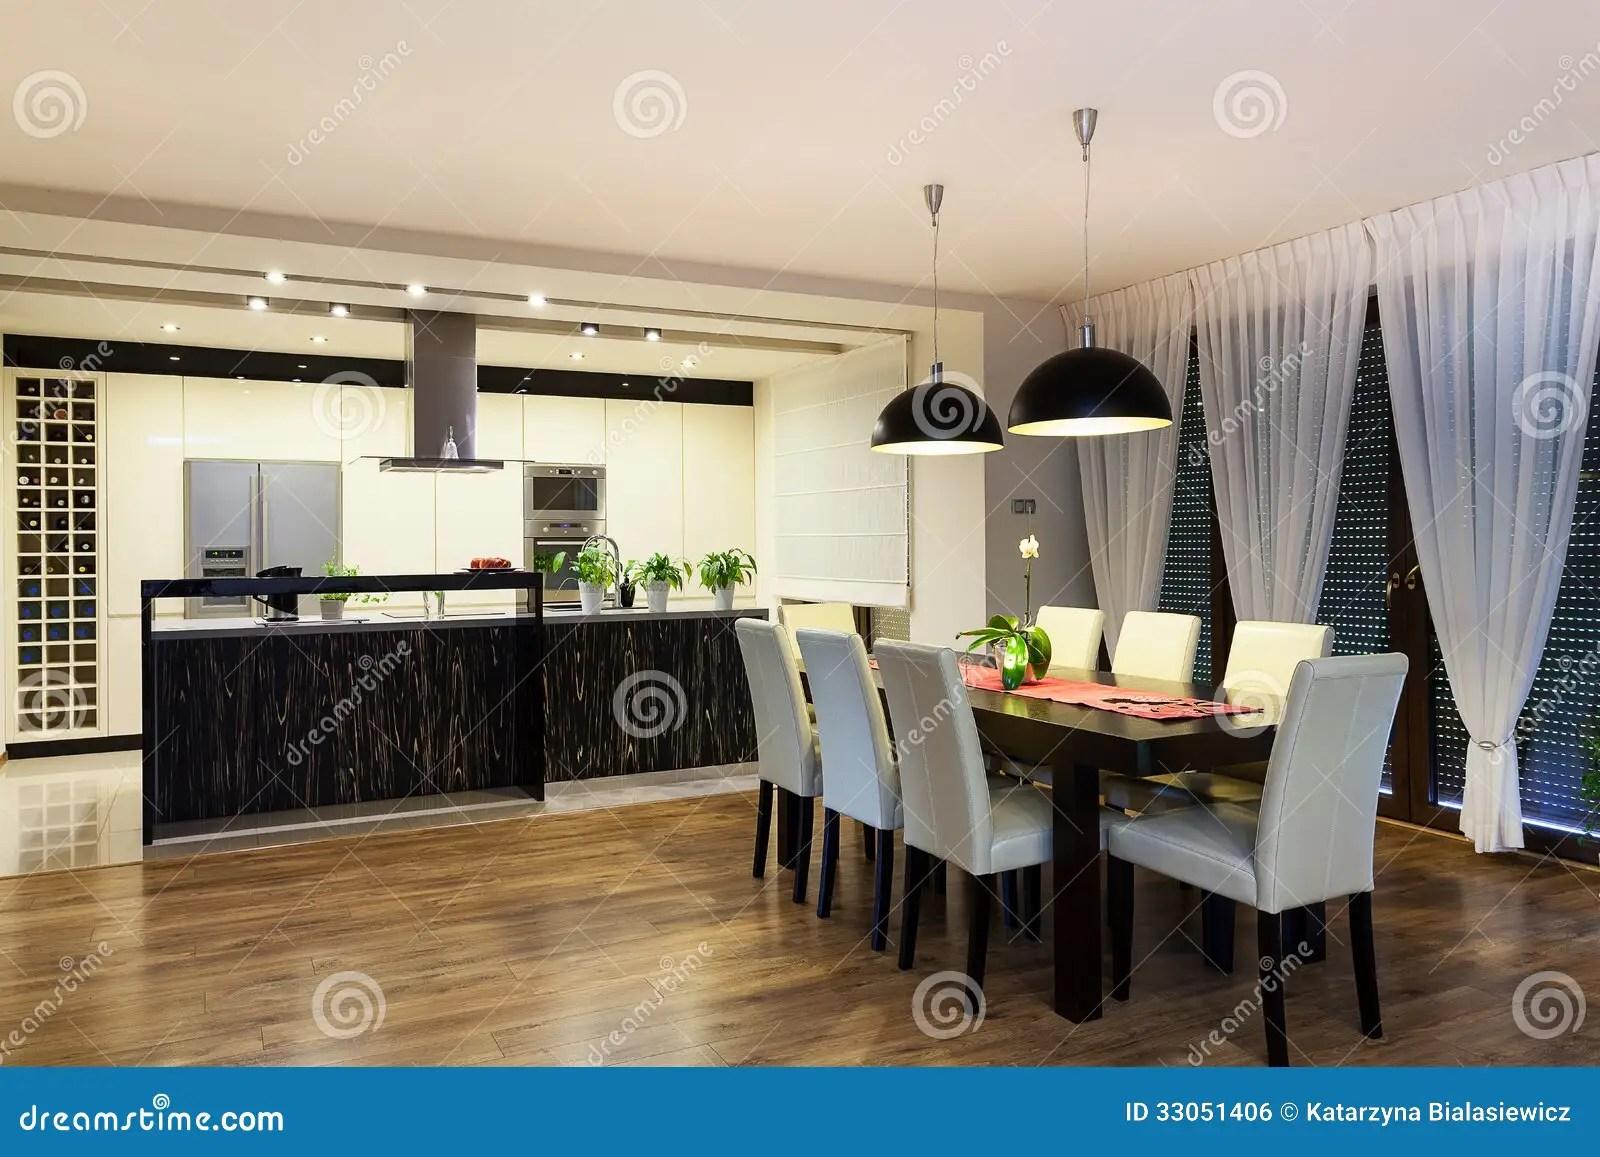 kitchen curtains for sale big sinks 都市公寓 厨房和客厅库存照片 图片包括有庄园 窗帘 工厂 现代 房子 厨房和客厅